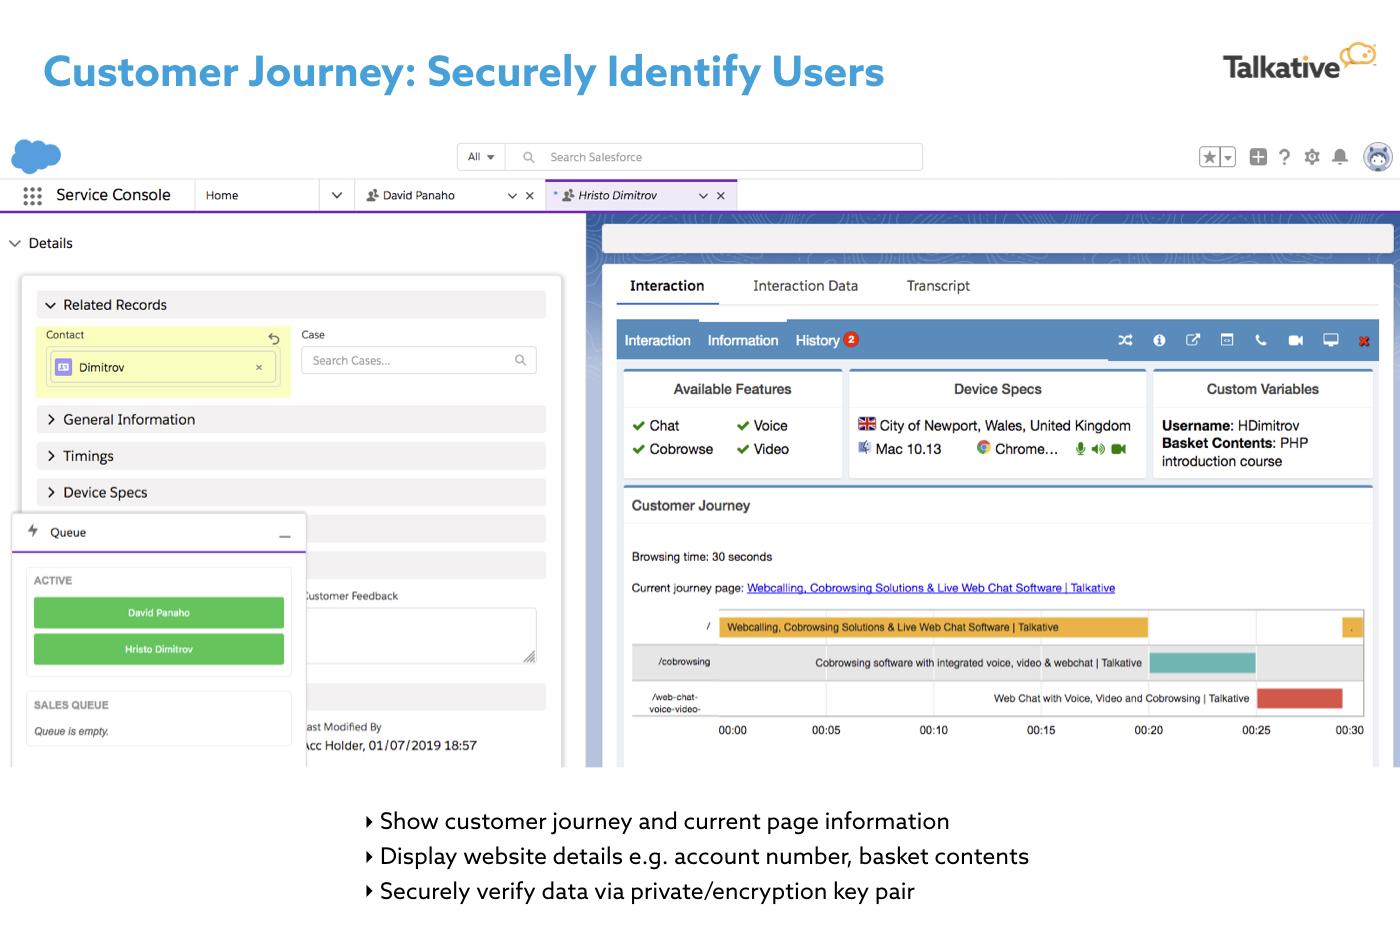 Customer journey tracking dashboard